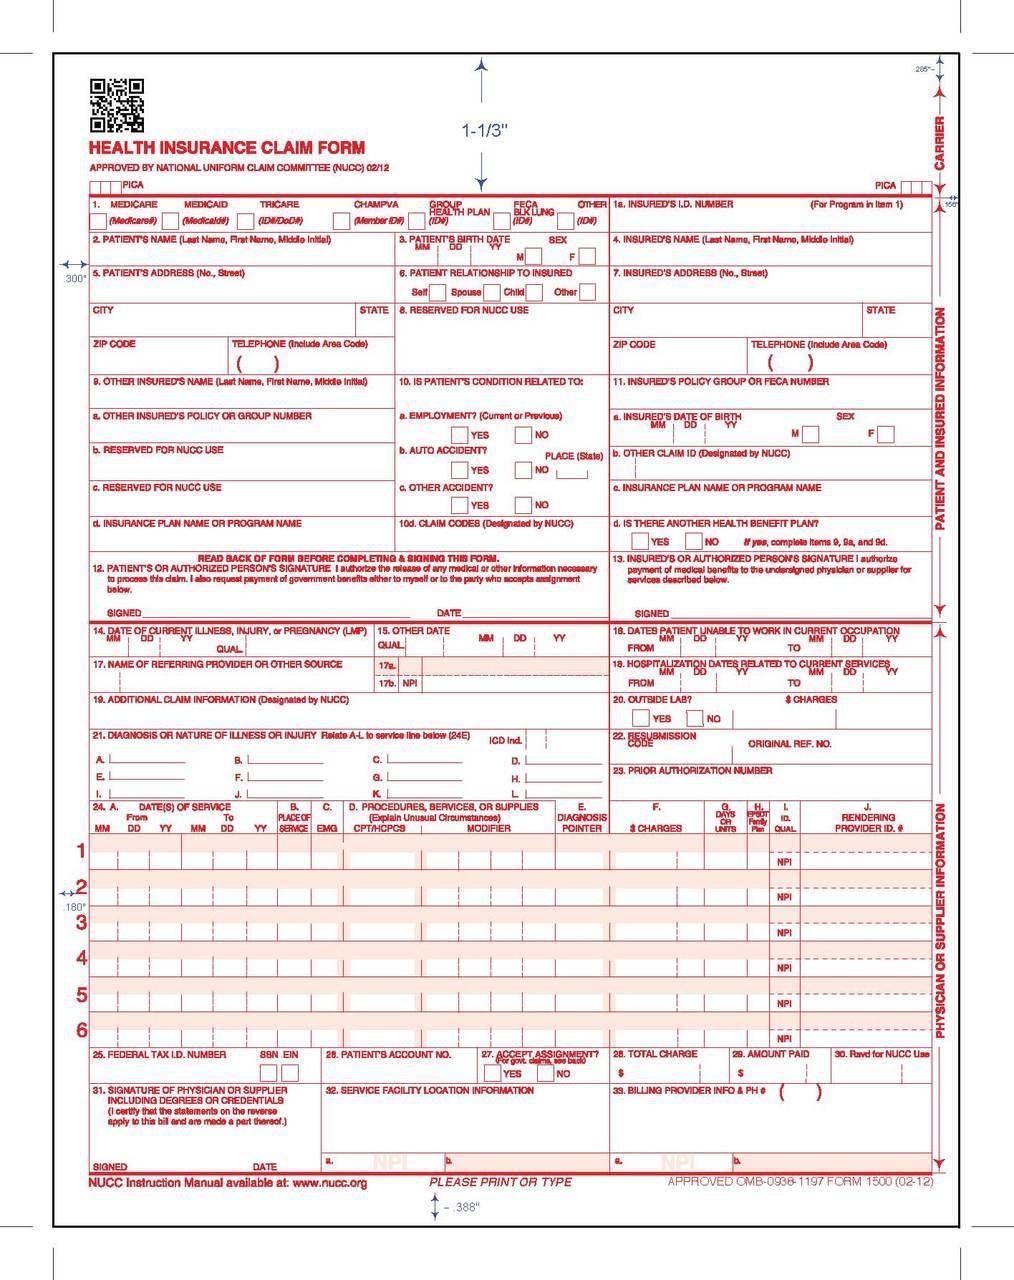 Cms Form 1500 Version 0212 Instructions